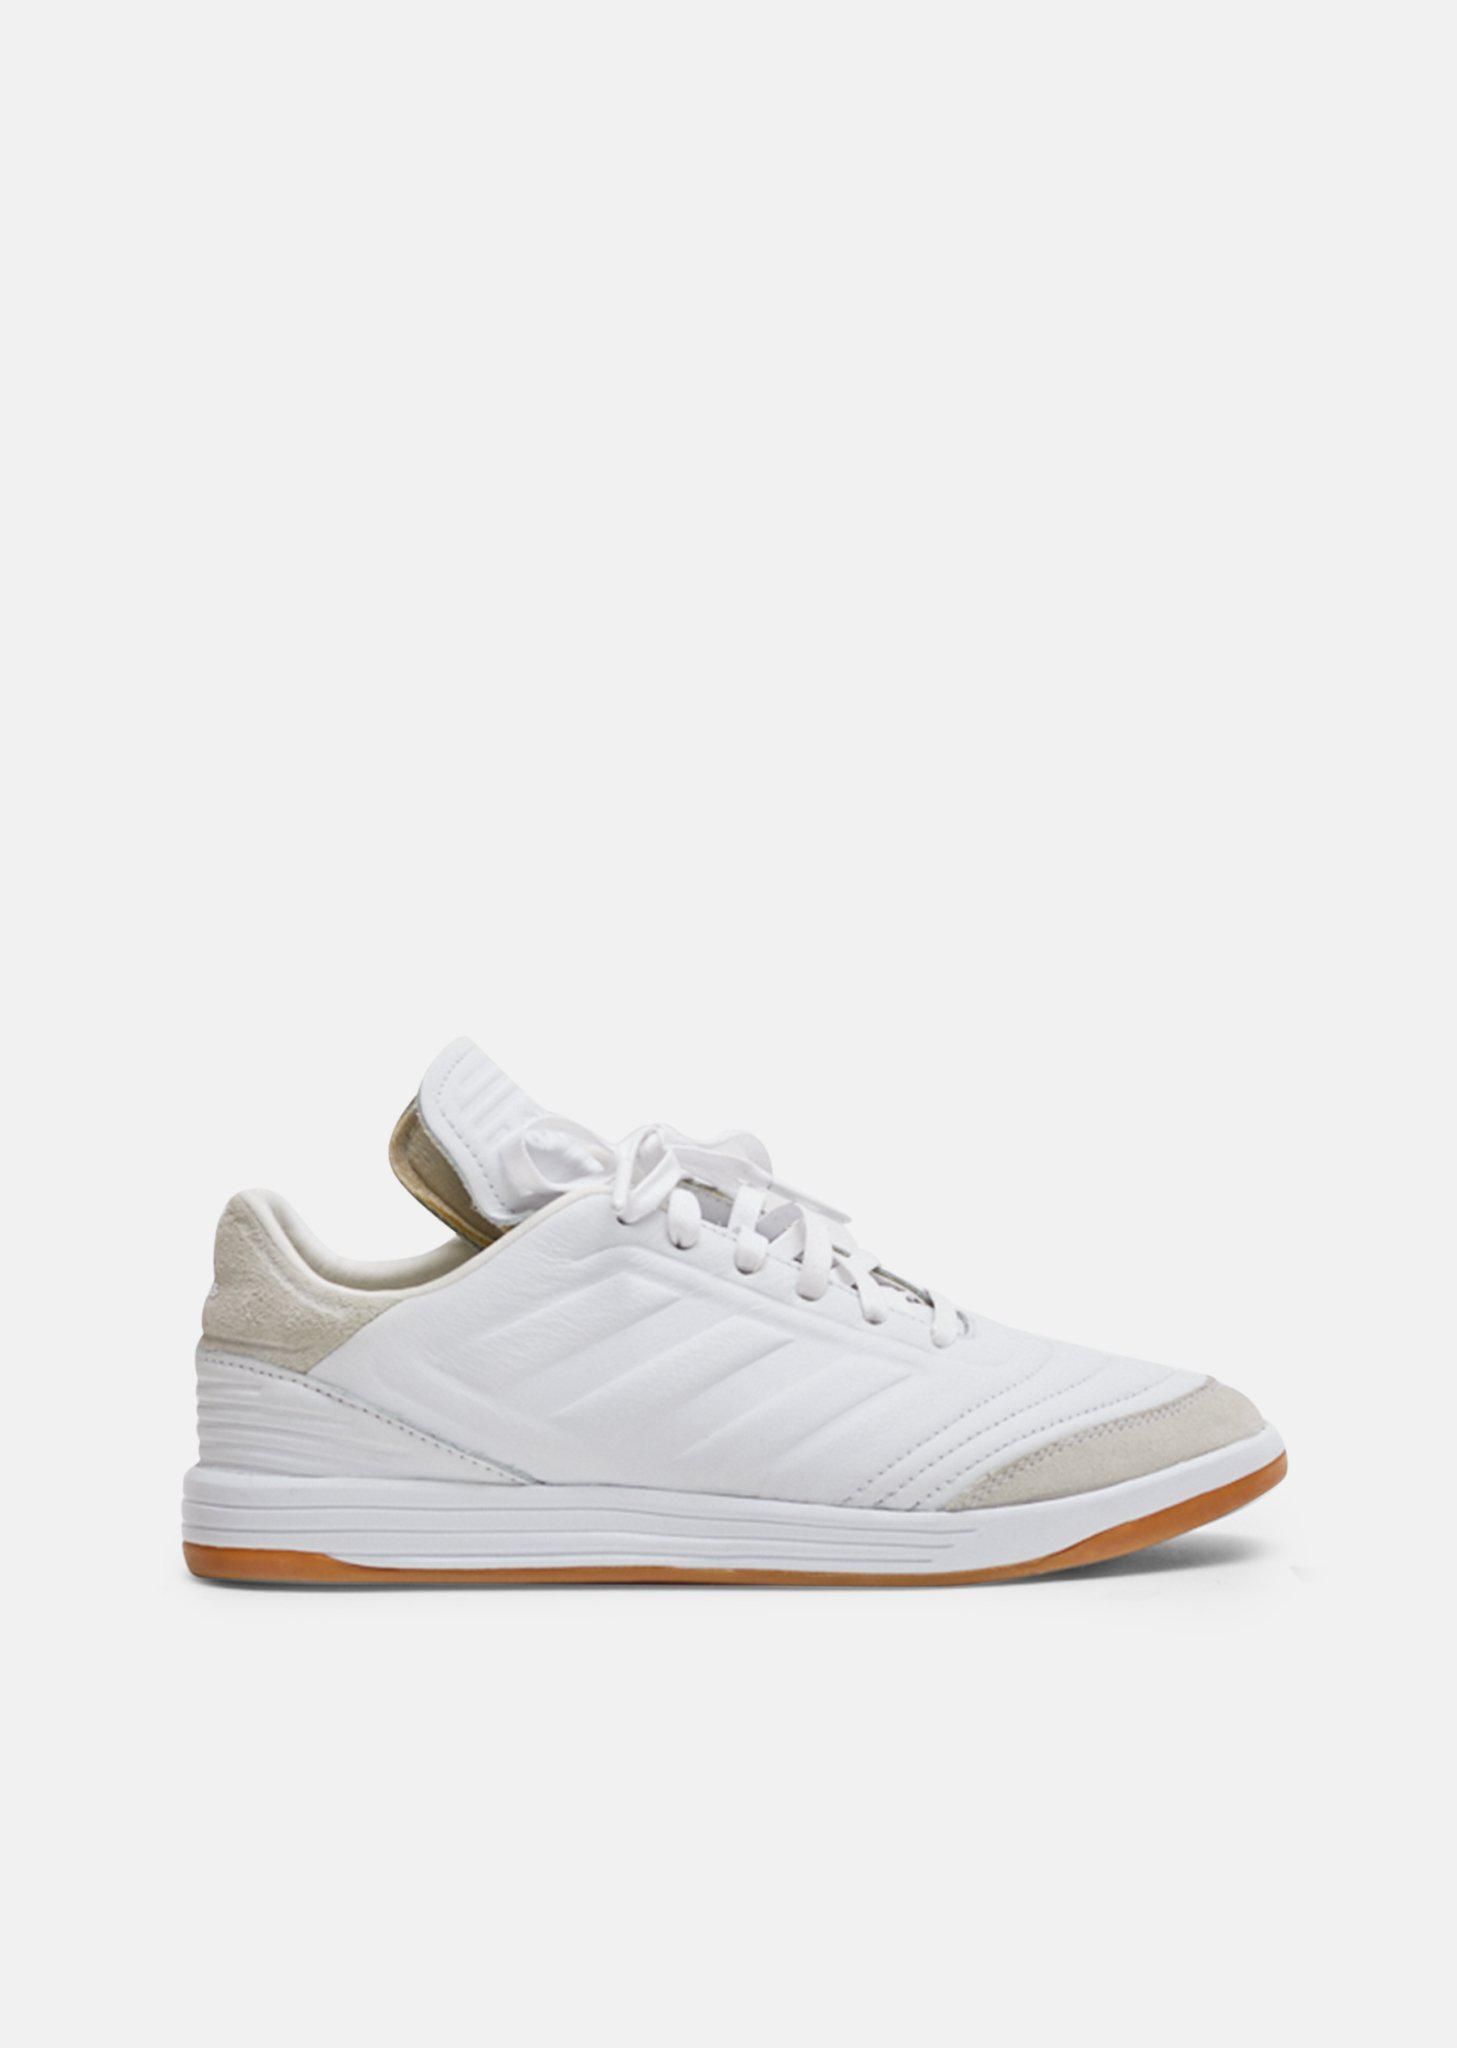 sale retailer 56ccb e28e6 Lyst - Gosha Rubchinskiy Adidas Copa Trainer Leather Shoes i